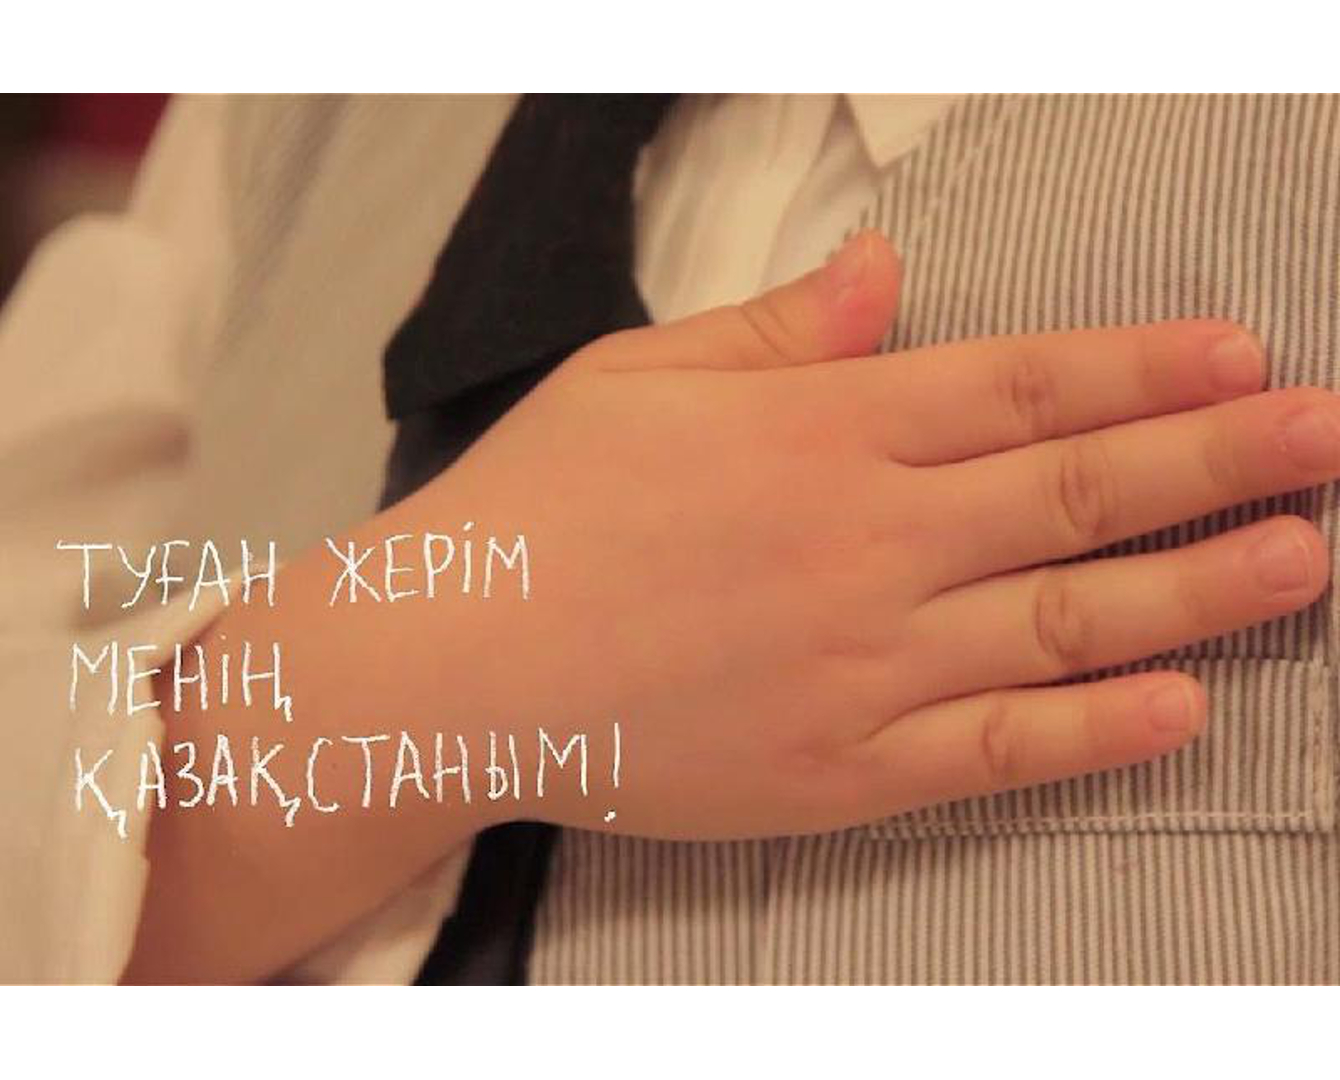 Как звучит гимн Казахстана на разных музыкальных инструментах